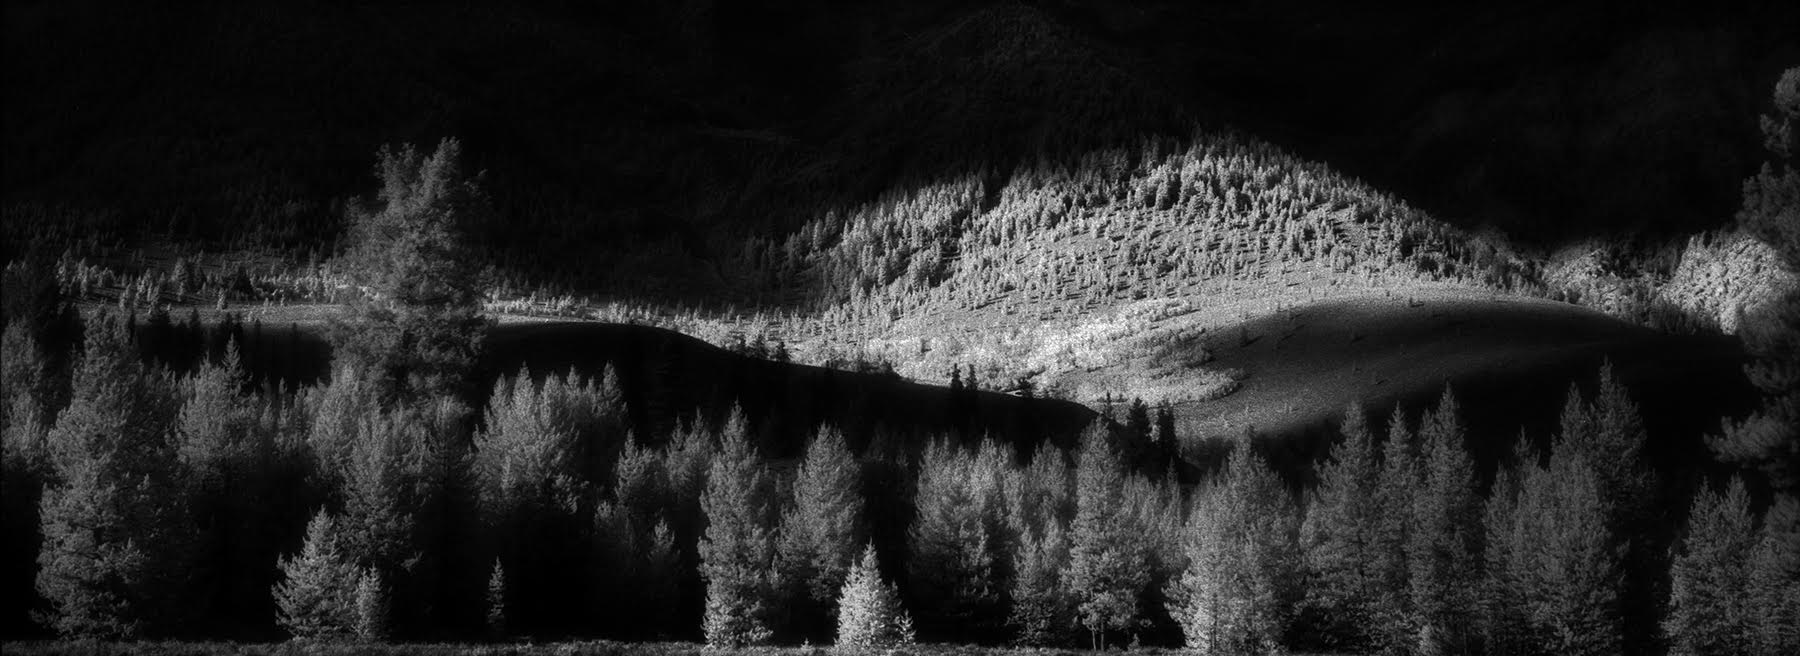 Boulder sunset…Aug. 2007 Hasselblad Xpan, 90mm, Maco IR820c